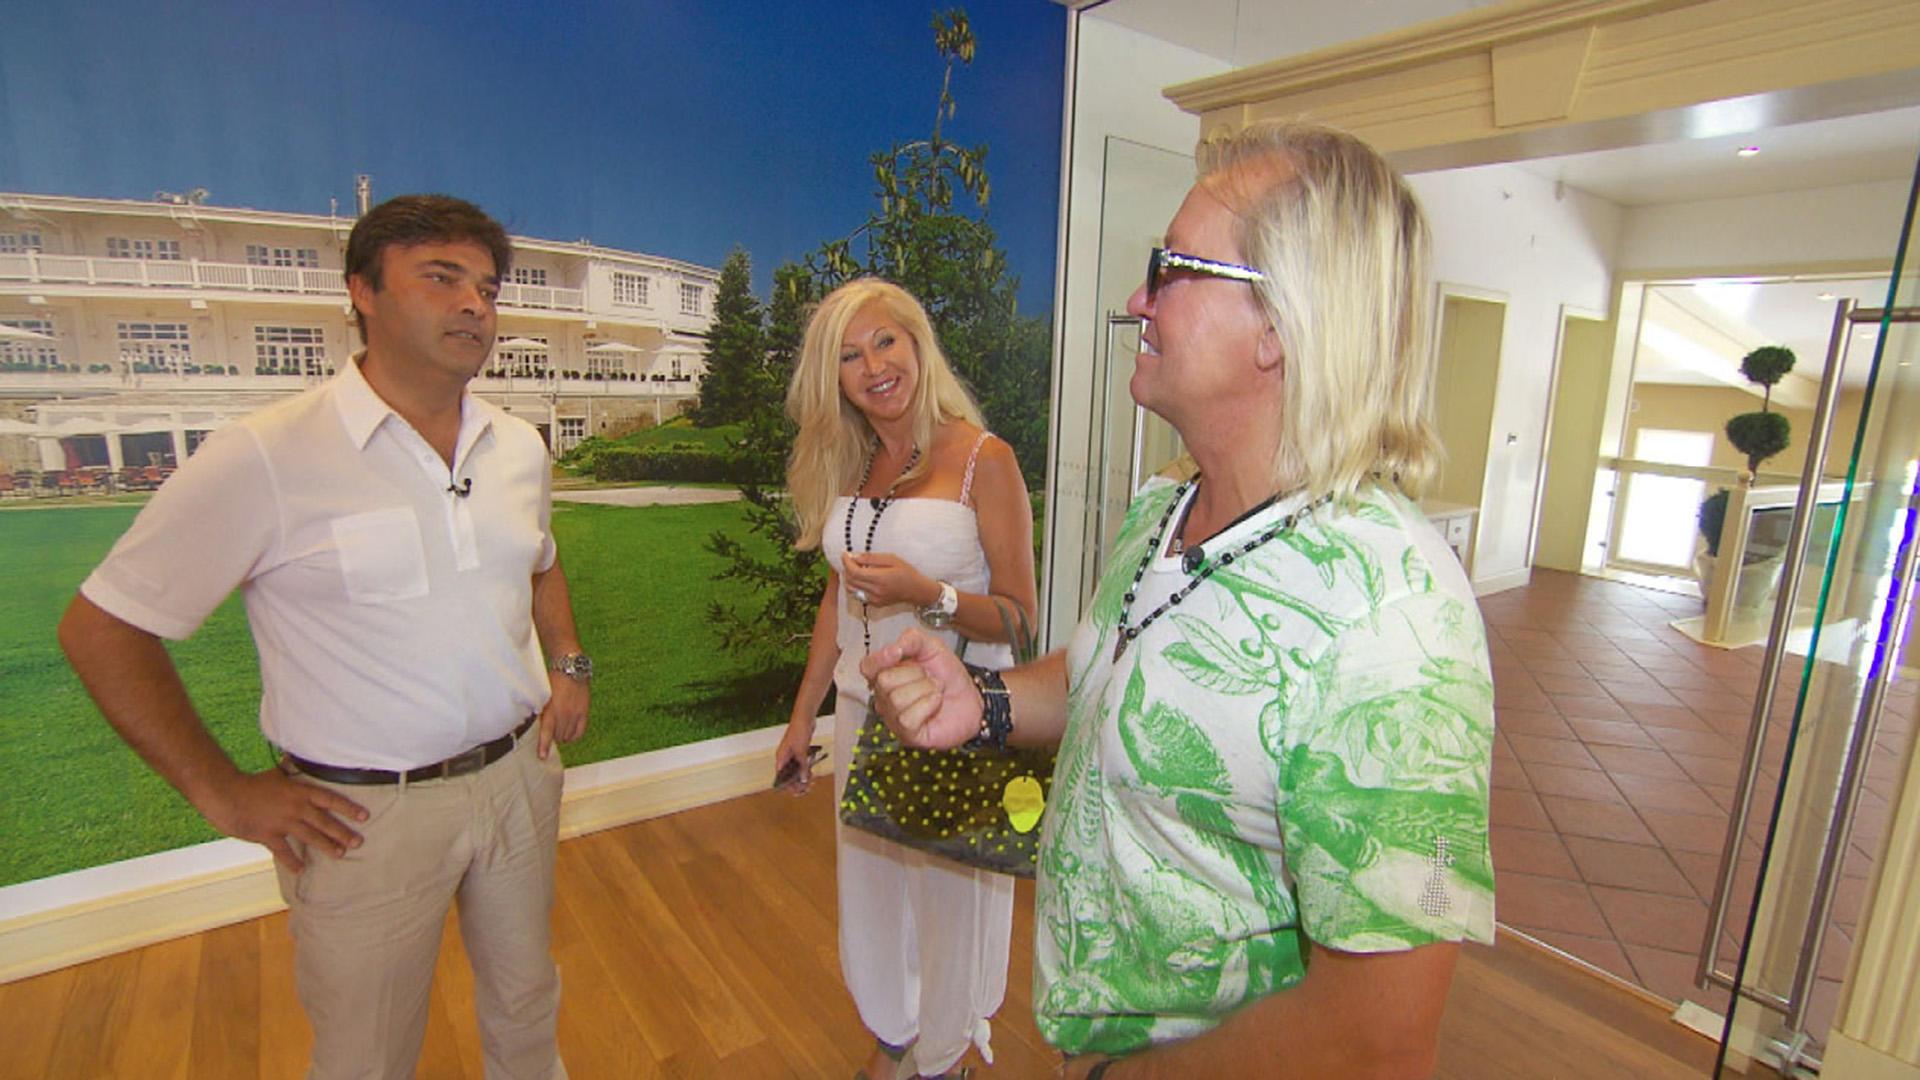 Eine Millionärsfamilie in Bulgarien | Folge 59